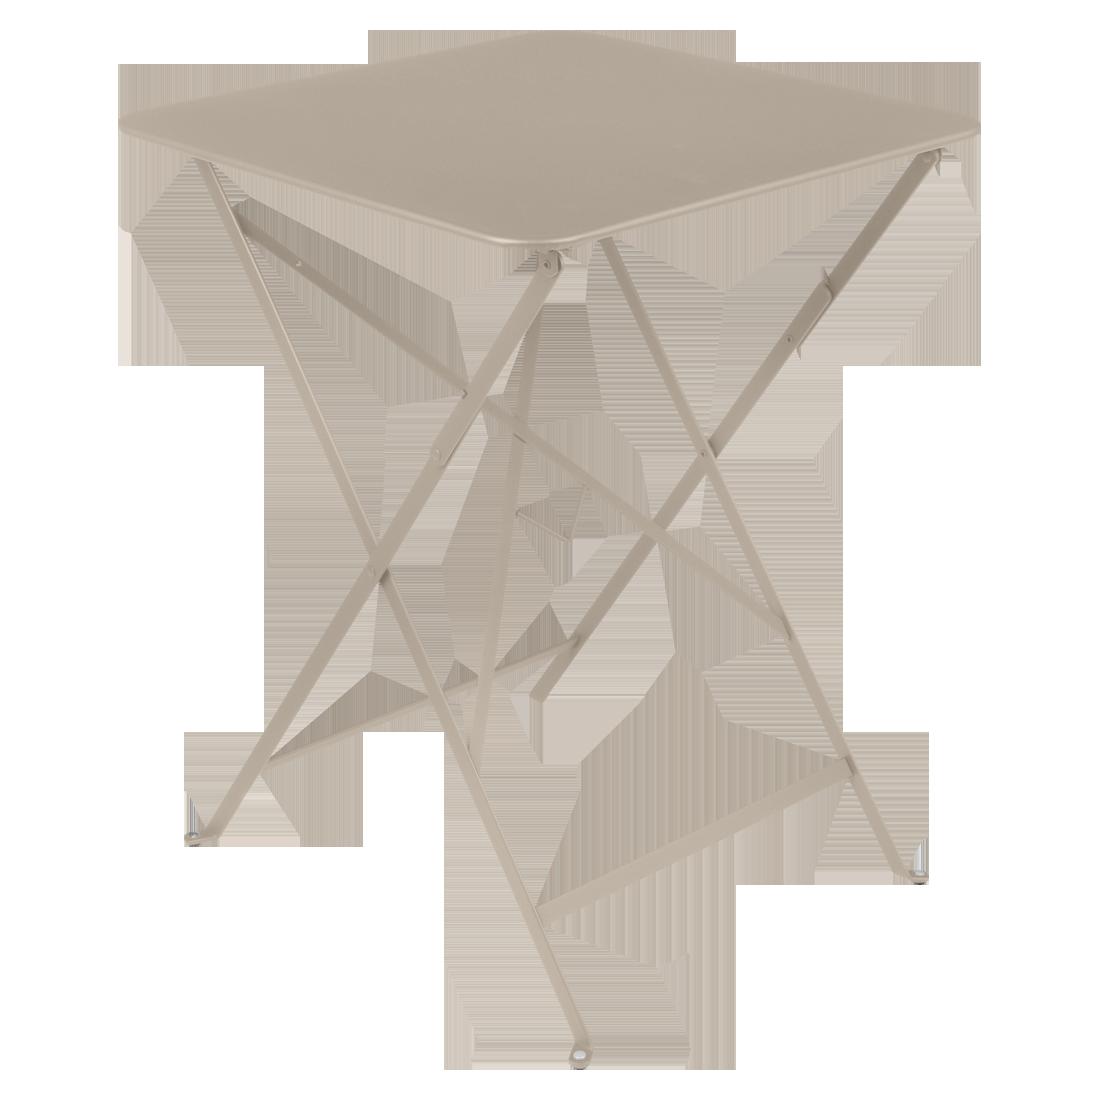 petite table metal, table fermob, table beige